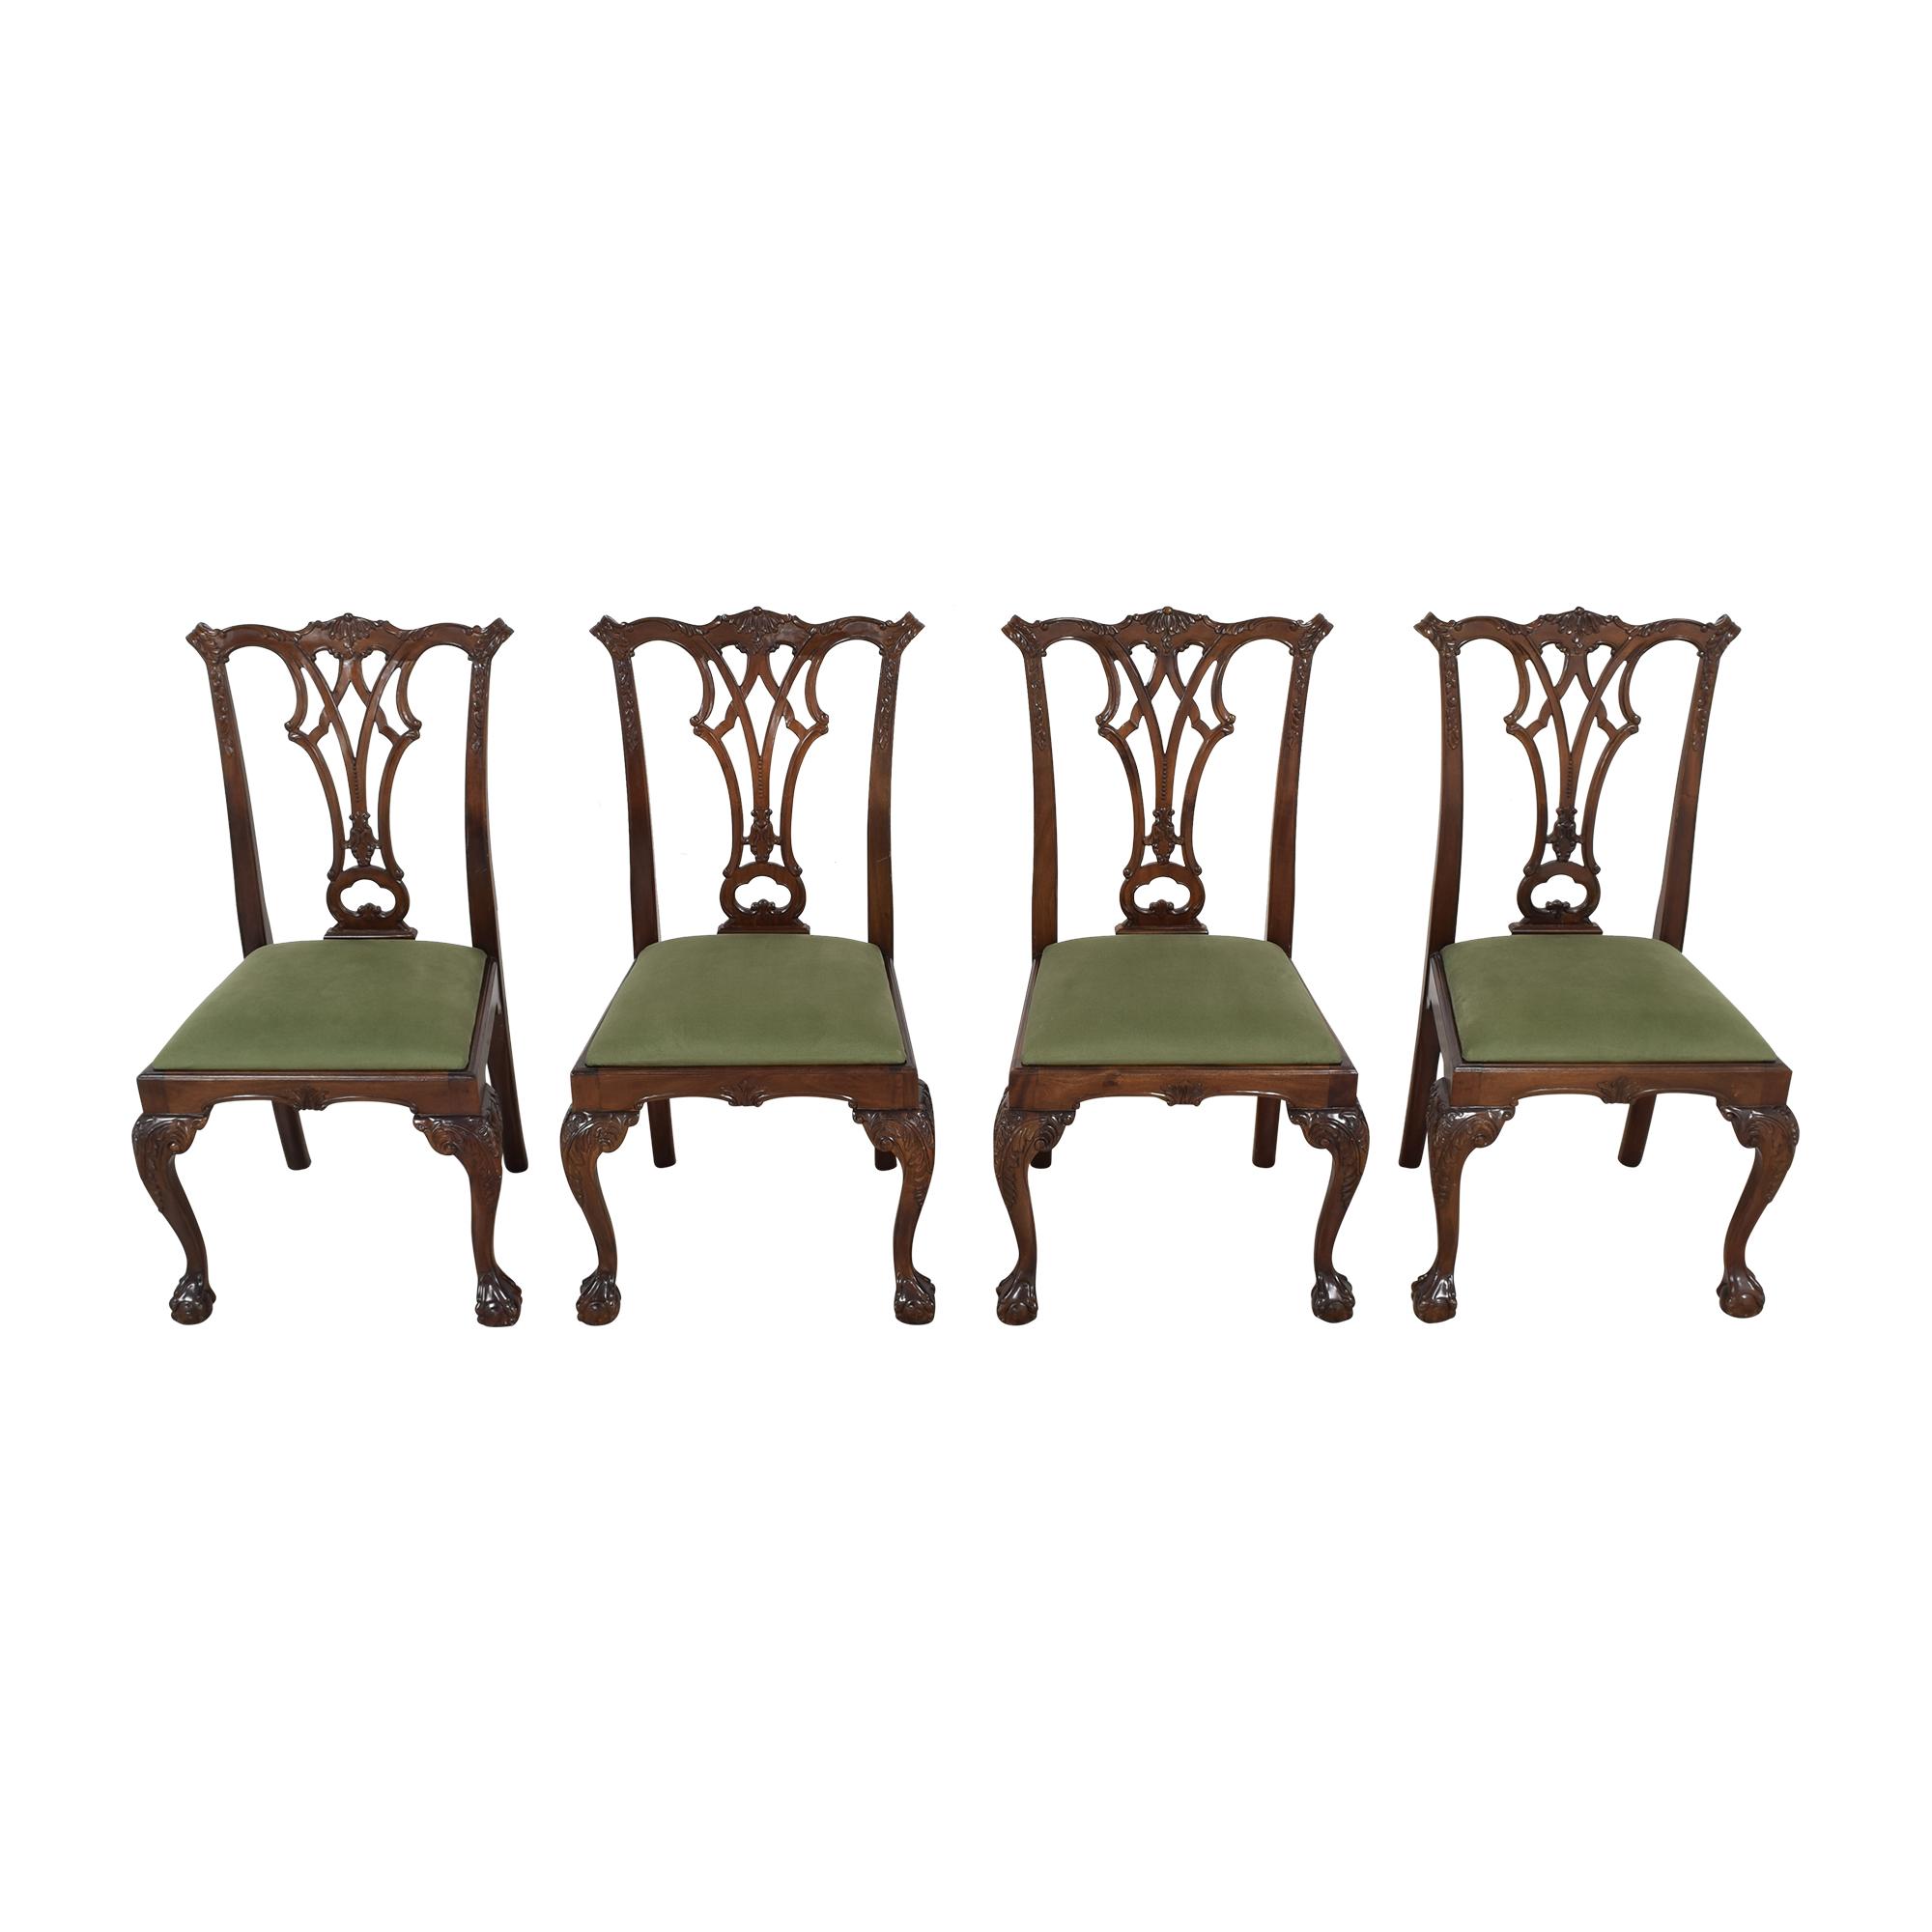 Greenbaum Interiors Greenbaum Interiors Vintage Upholstered Dining Chairs pa